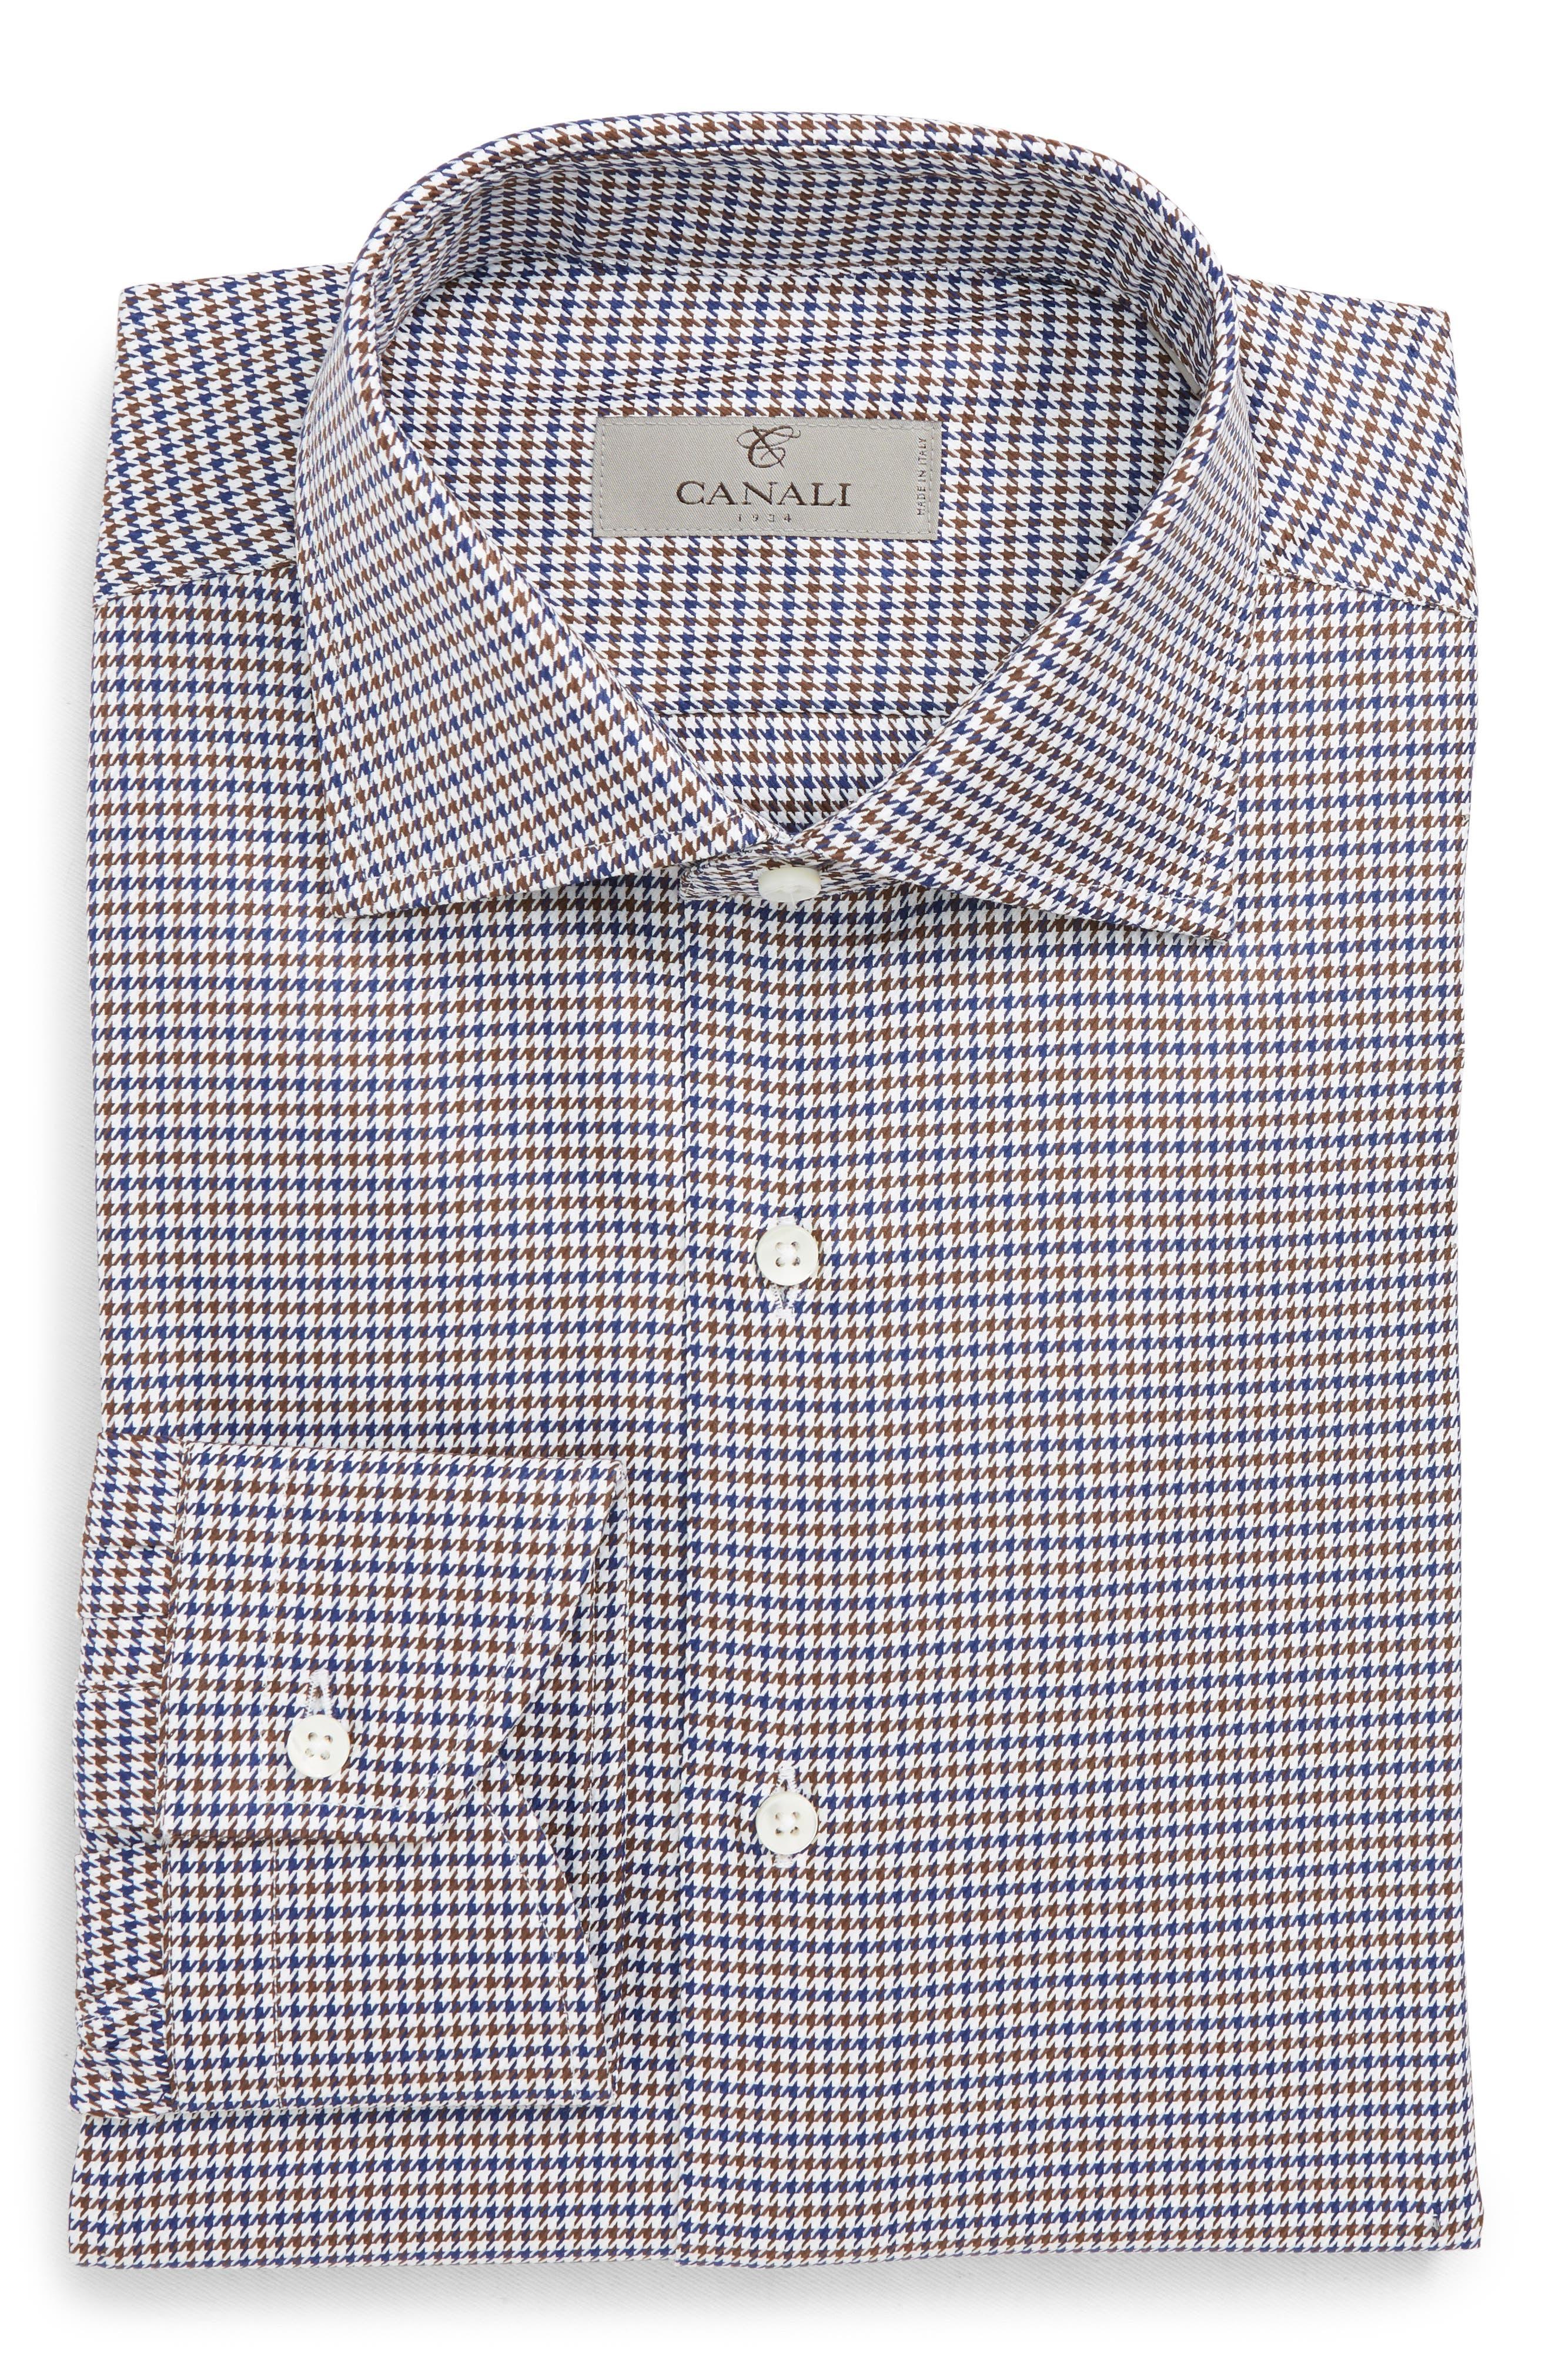 Regular Fit Houndstooth Dress Shirt,                             Alternate thumbnail 6, color,                             NAVY/ BROWN